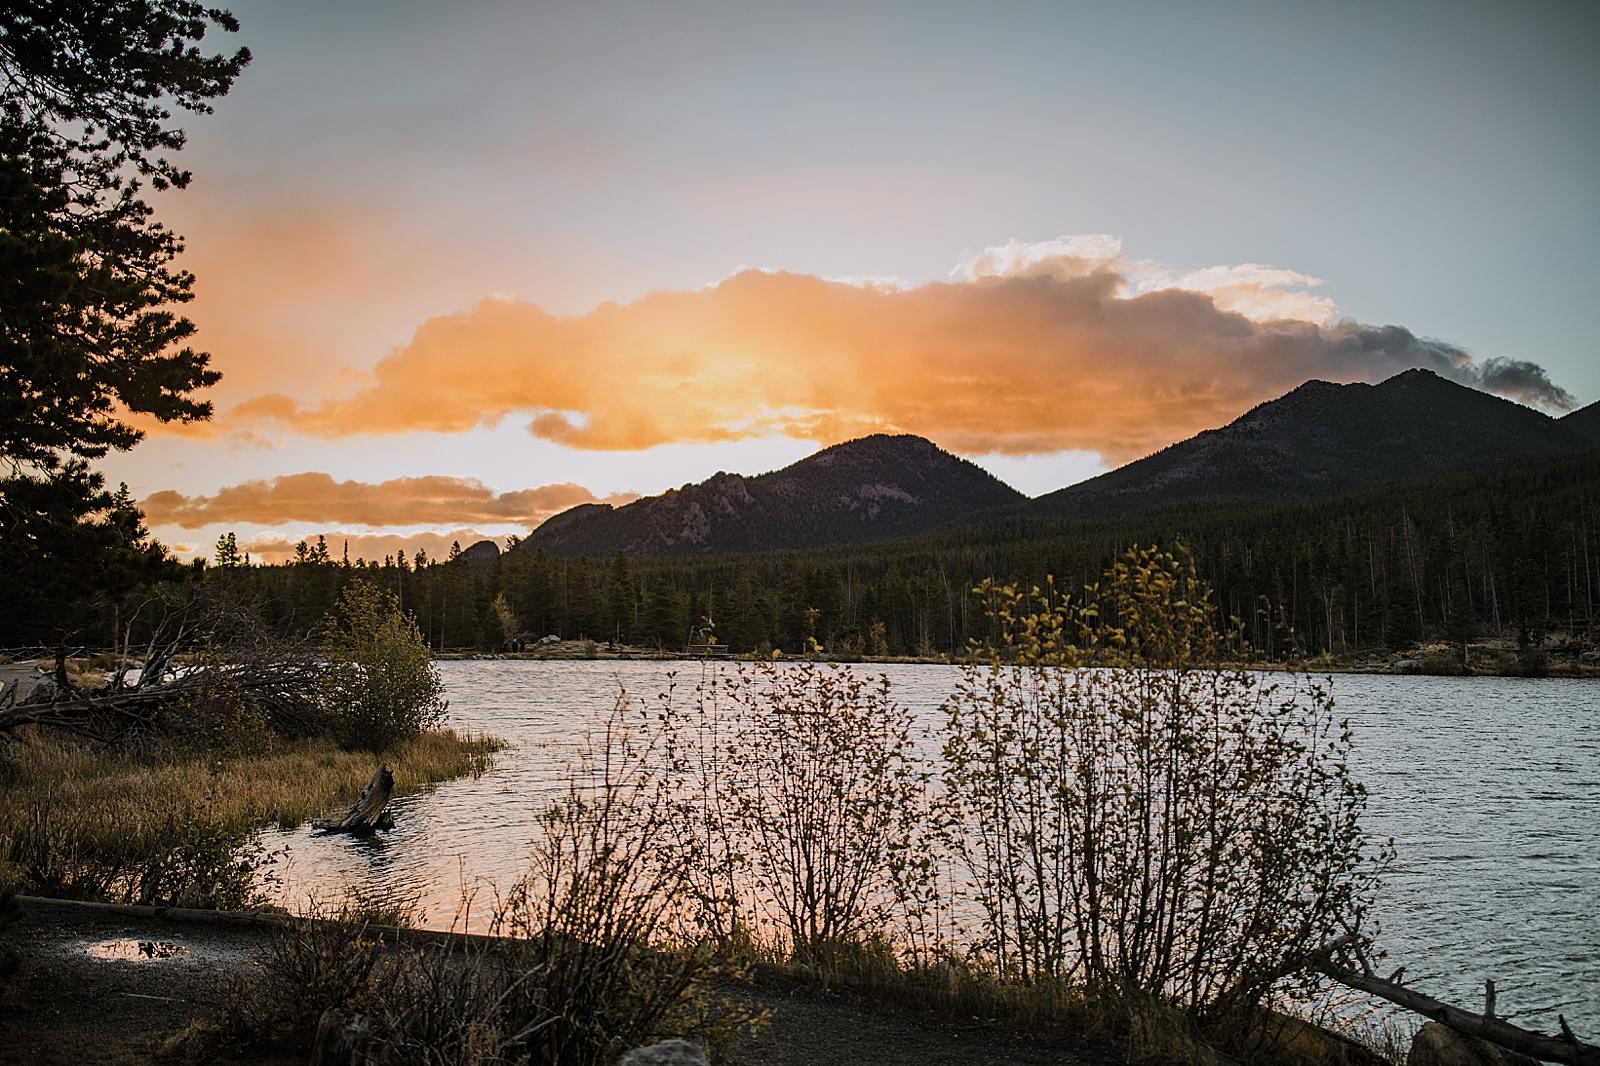 sprague lake sunrise, sunrise elopement, colorado elopement, sprague lake elopement, sprague lake wedding, rocky mountain national park elopement, adventurous colorado hiking elopement